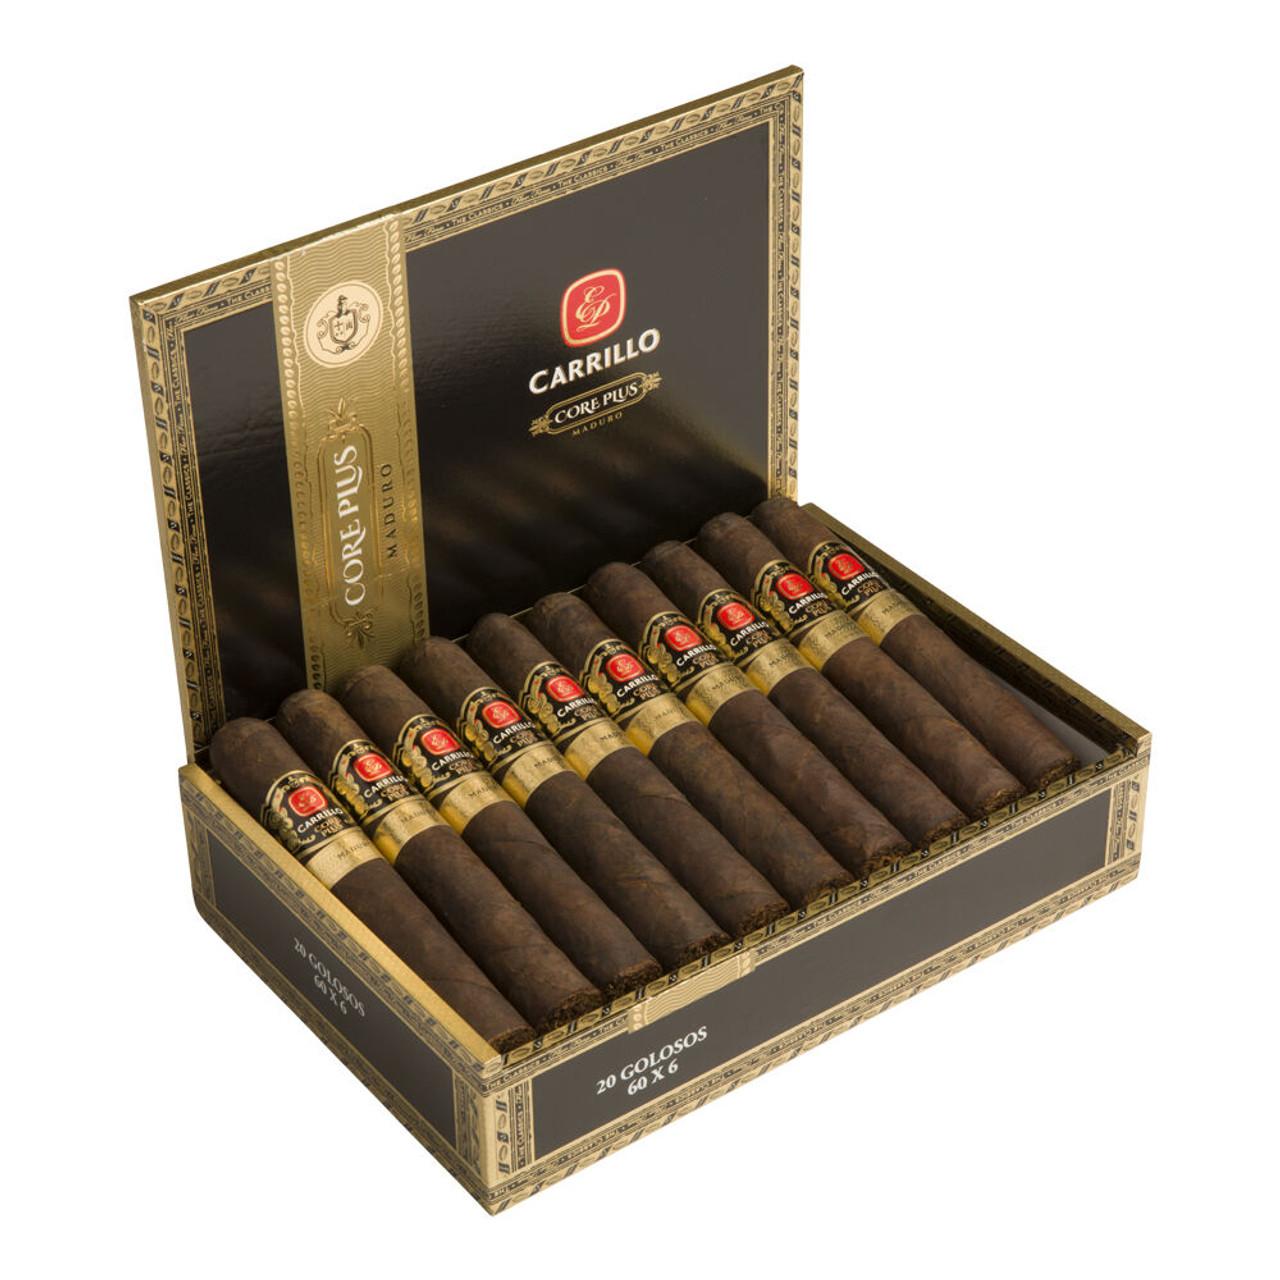 E.P. Carrillo Core Plus Encantos Maduro Cigars - 5 x 50 (Box of 20)